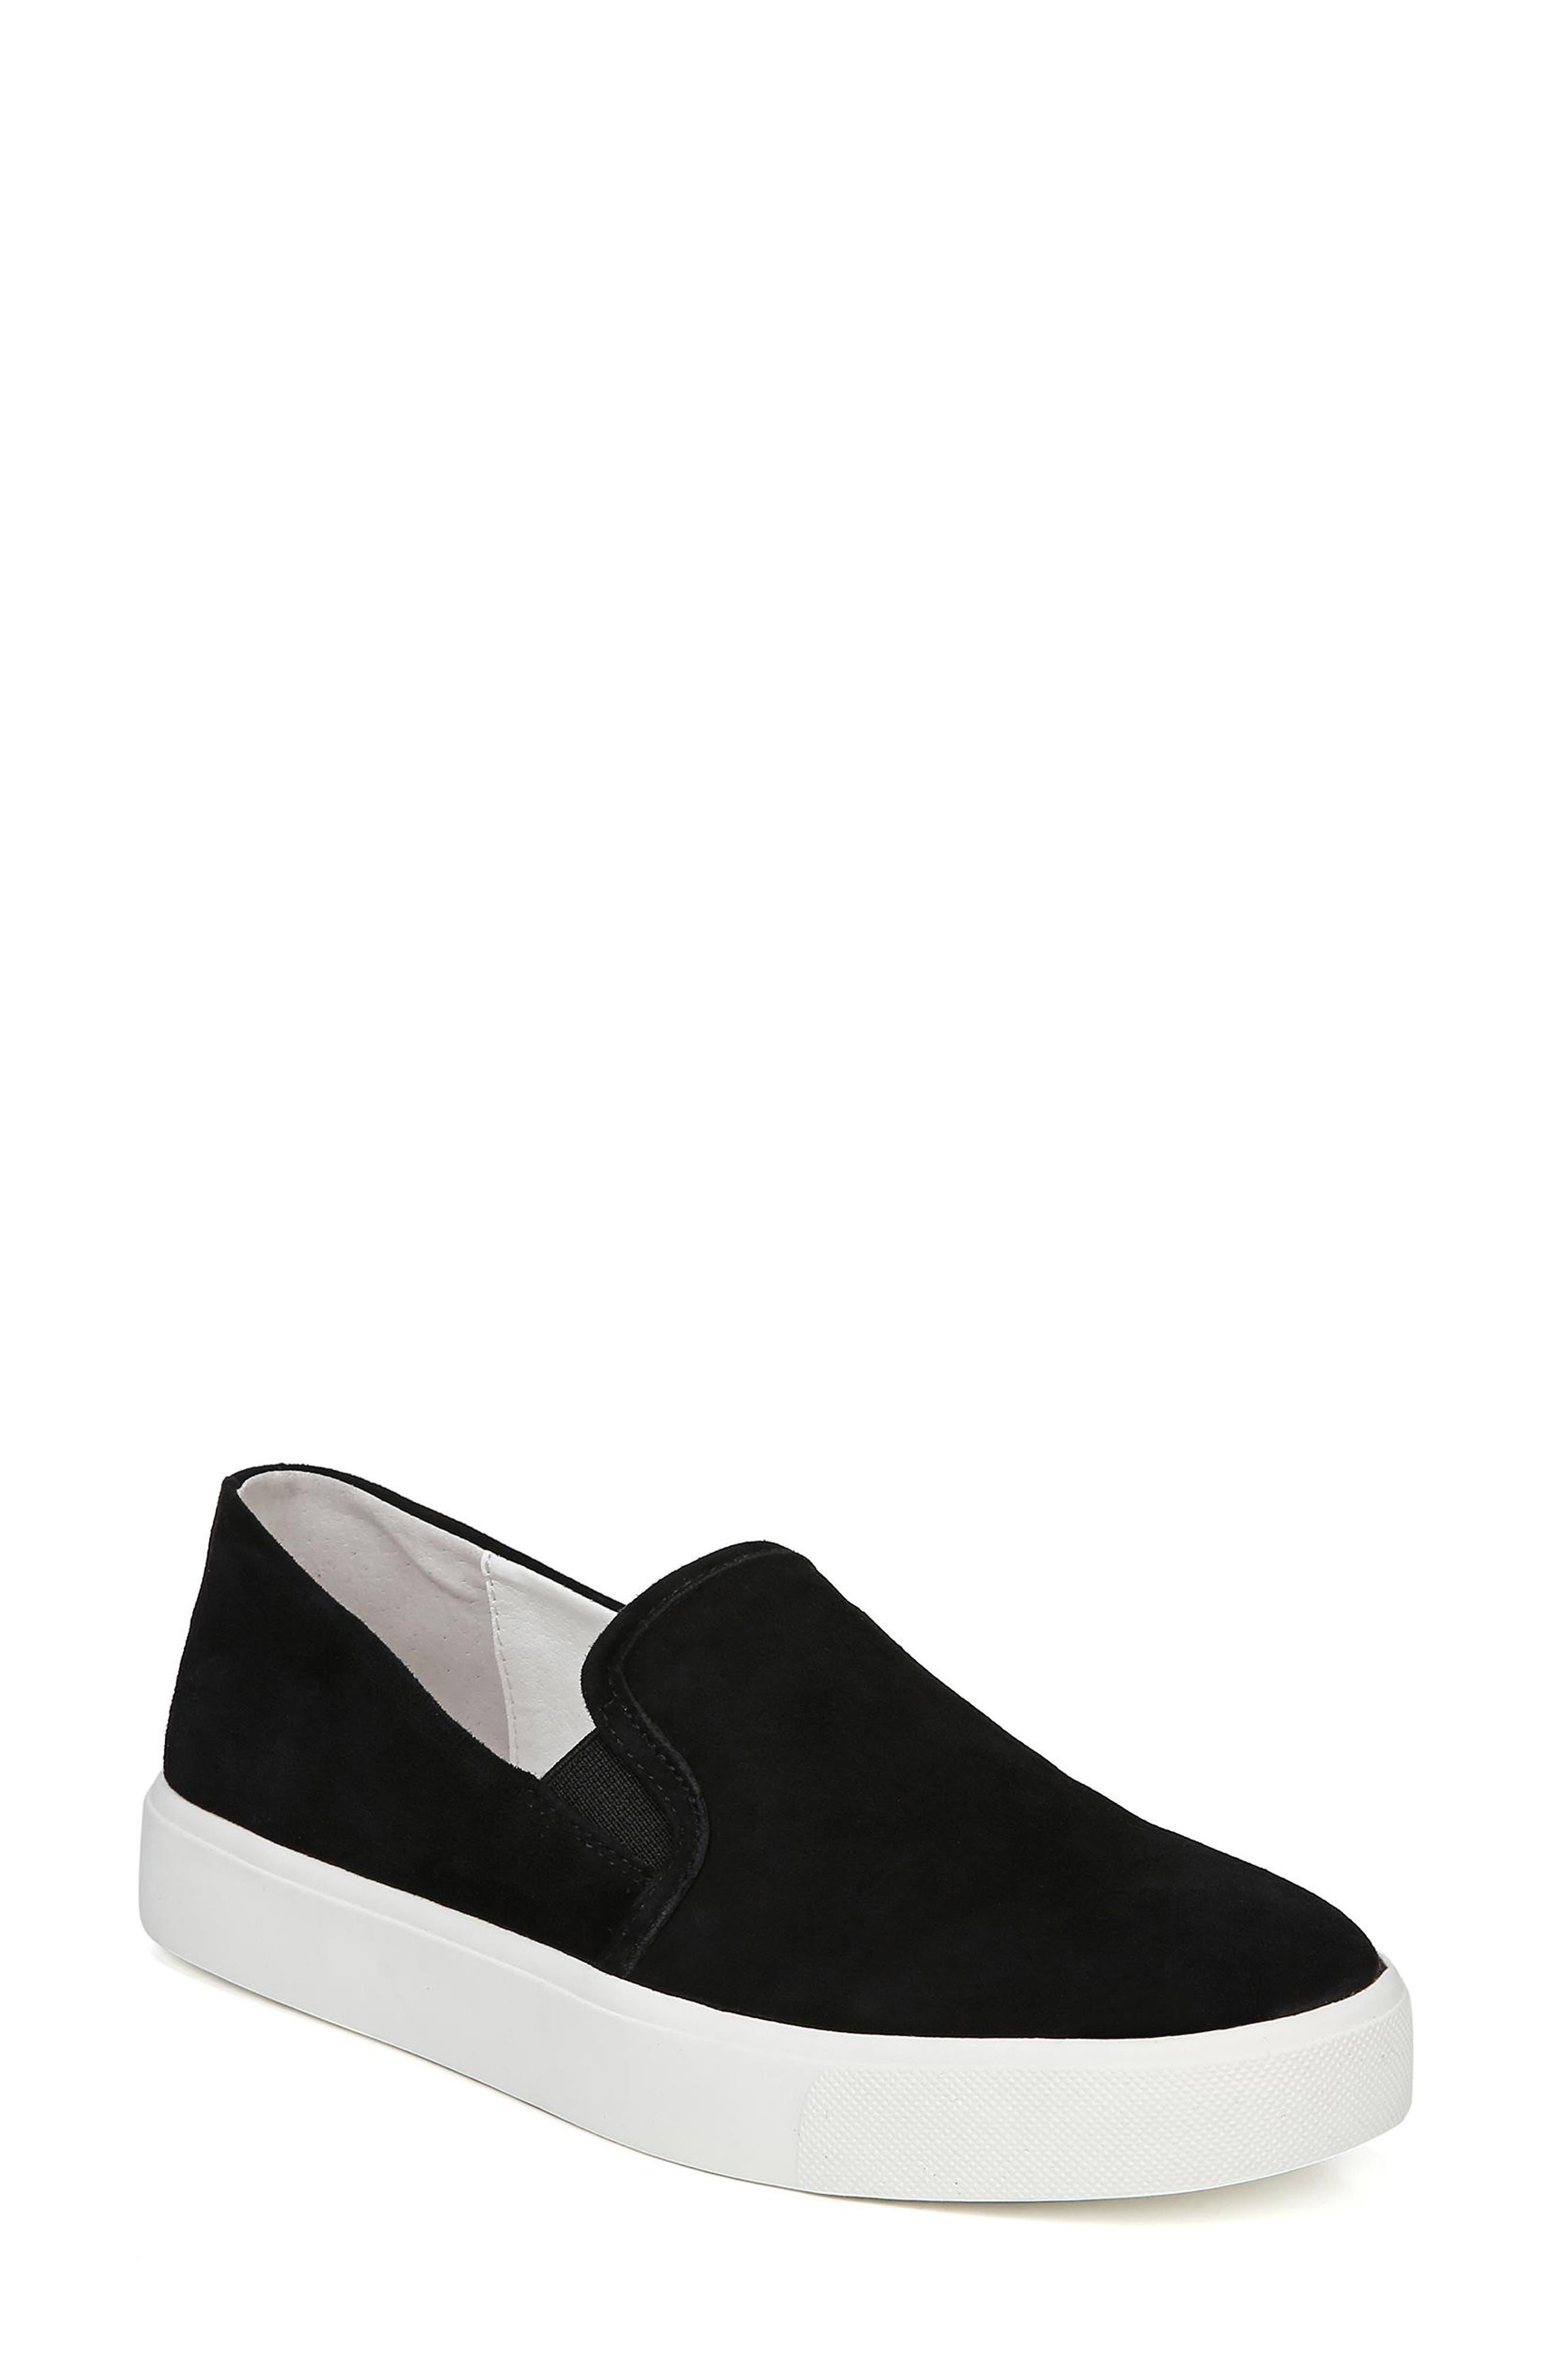 Elton Slip-On Sneaker,                         Main,                         color, BLACK SUEDE LEATHER